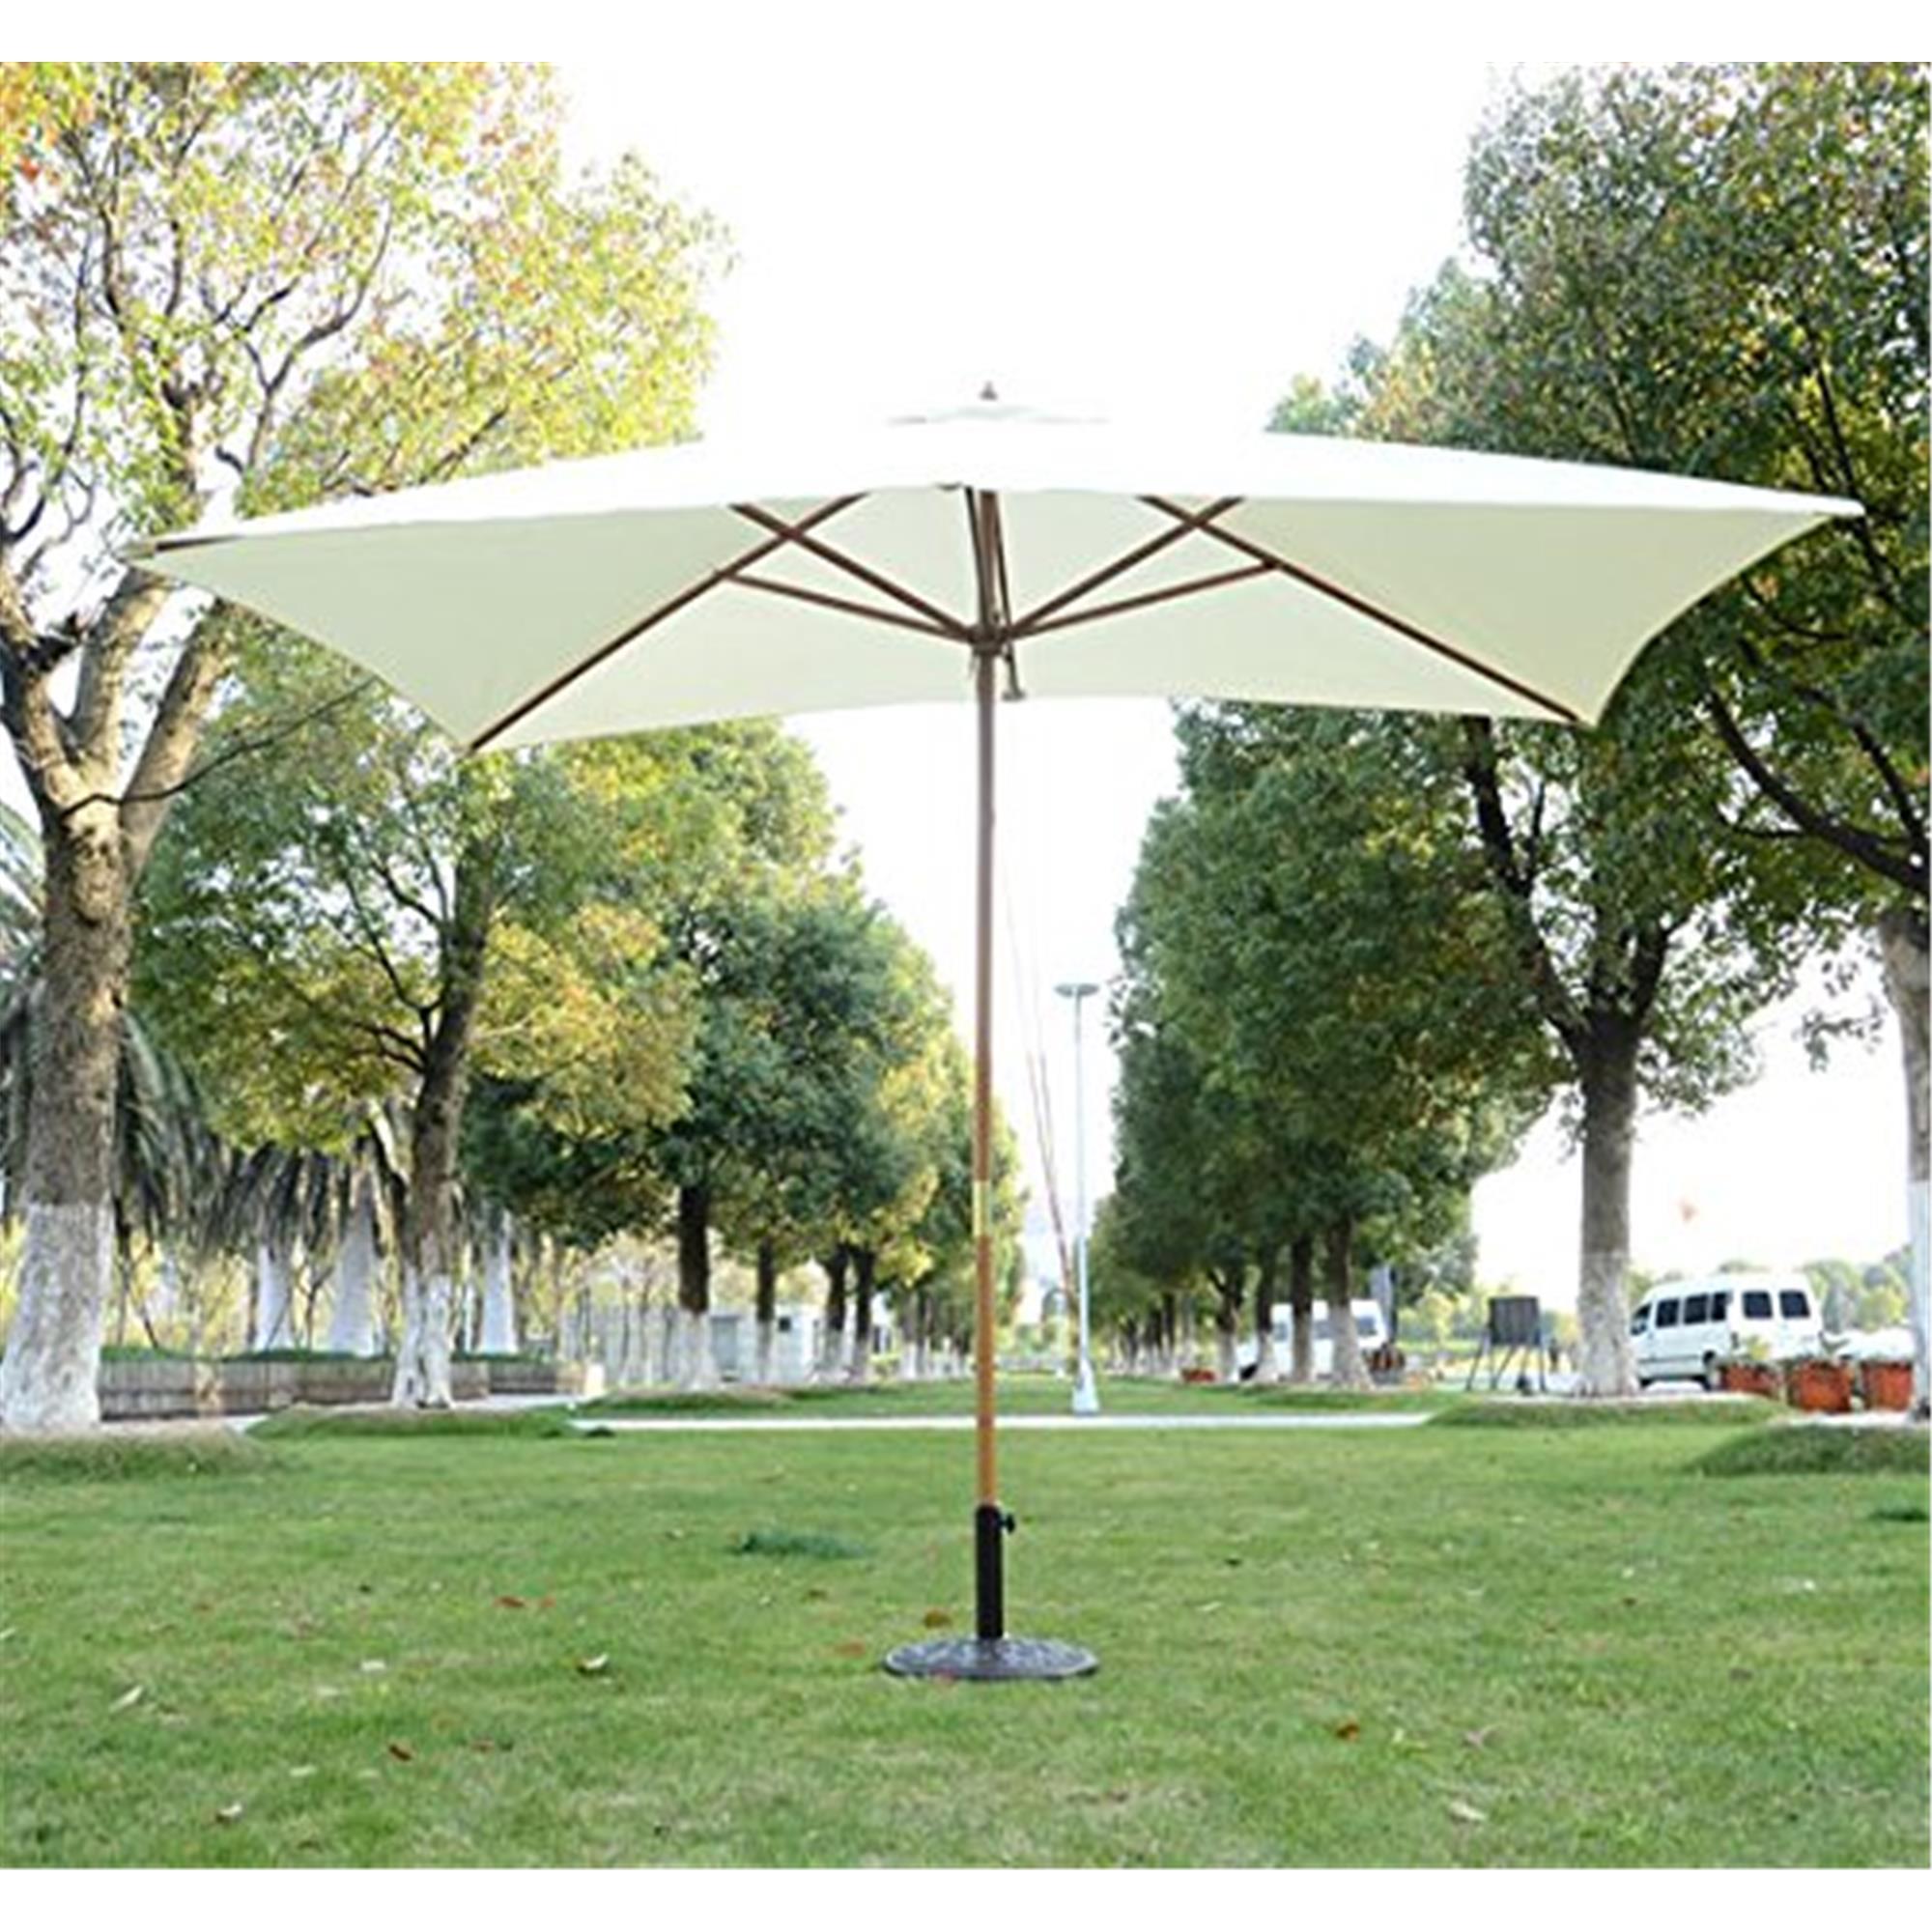 Sombrilla garu 2 x 3 m estructura madera tela crema sombrilla garu 2 x 3 m estructura - Ombrelloni da giardino 3x2 ...